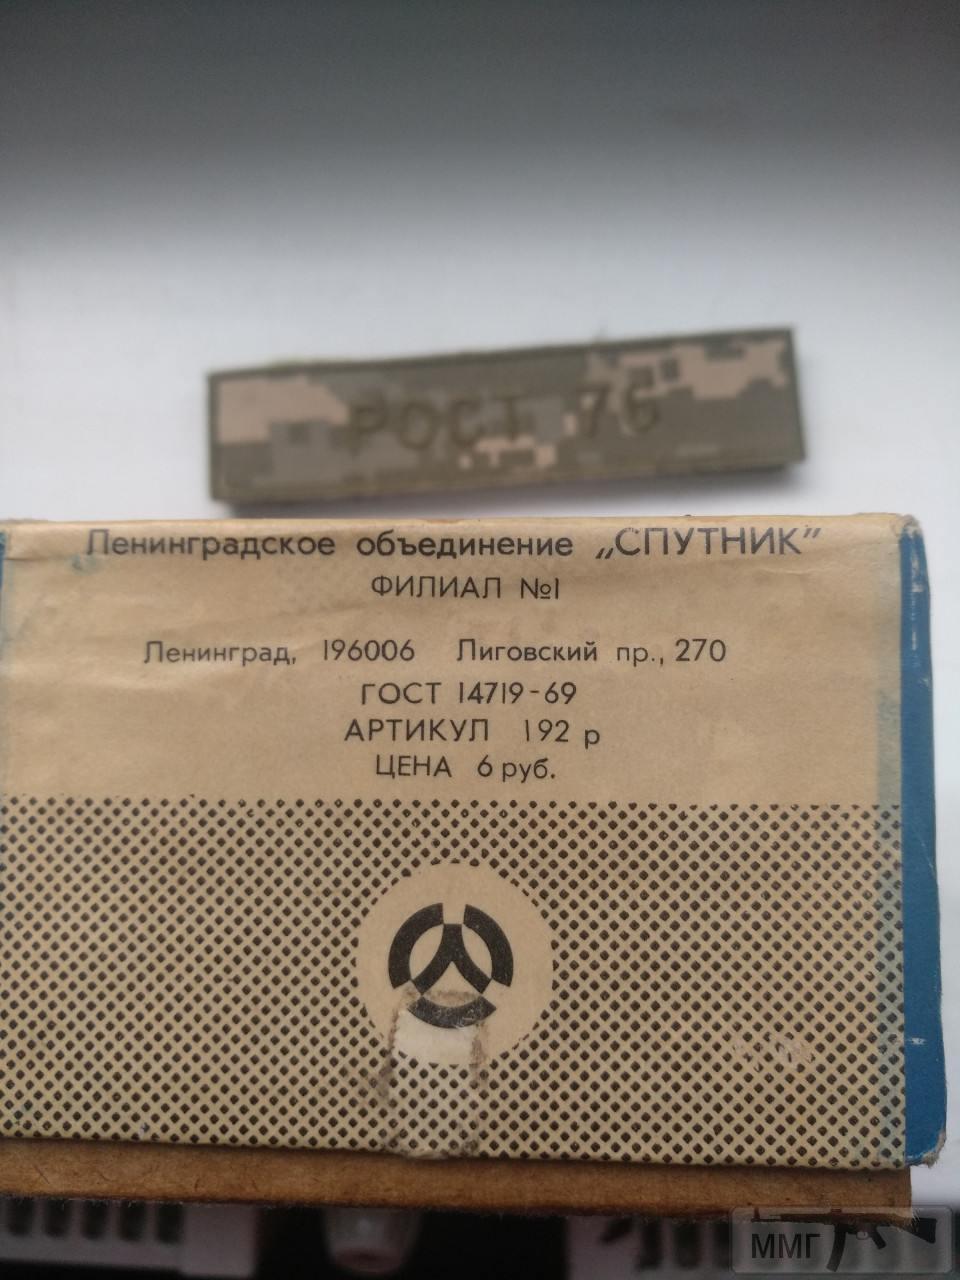 87769 - Механічна бритва ,,Спутник,,